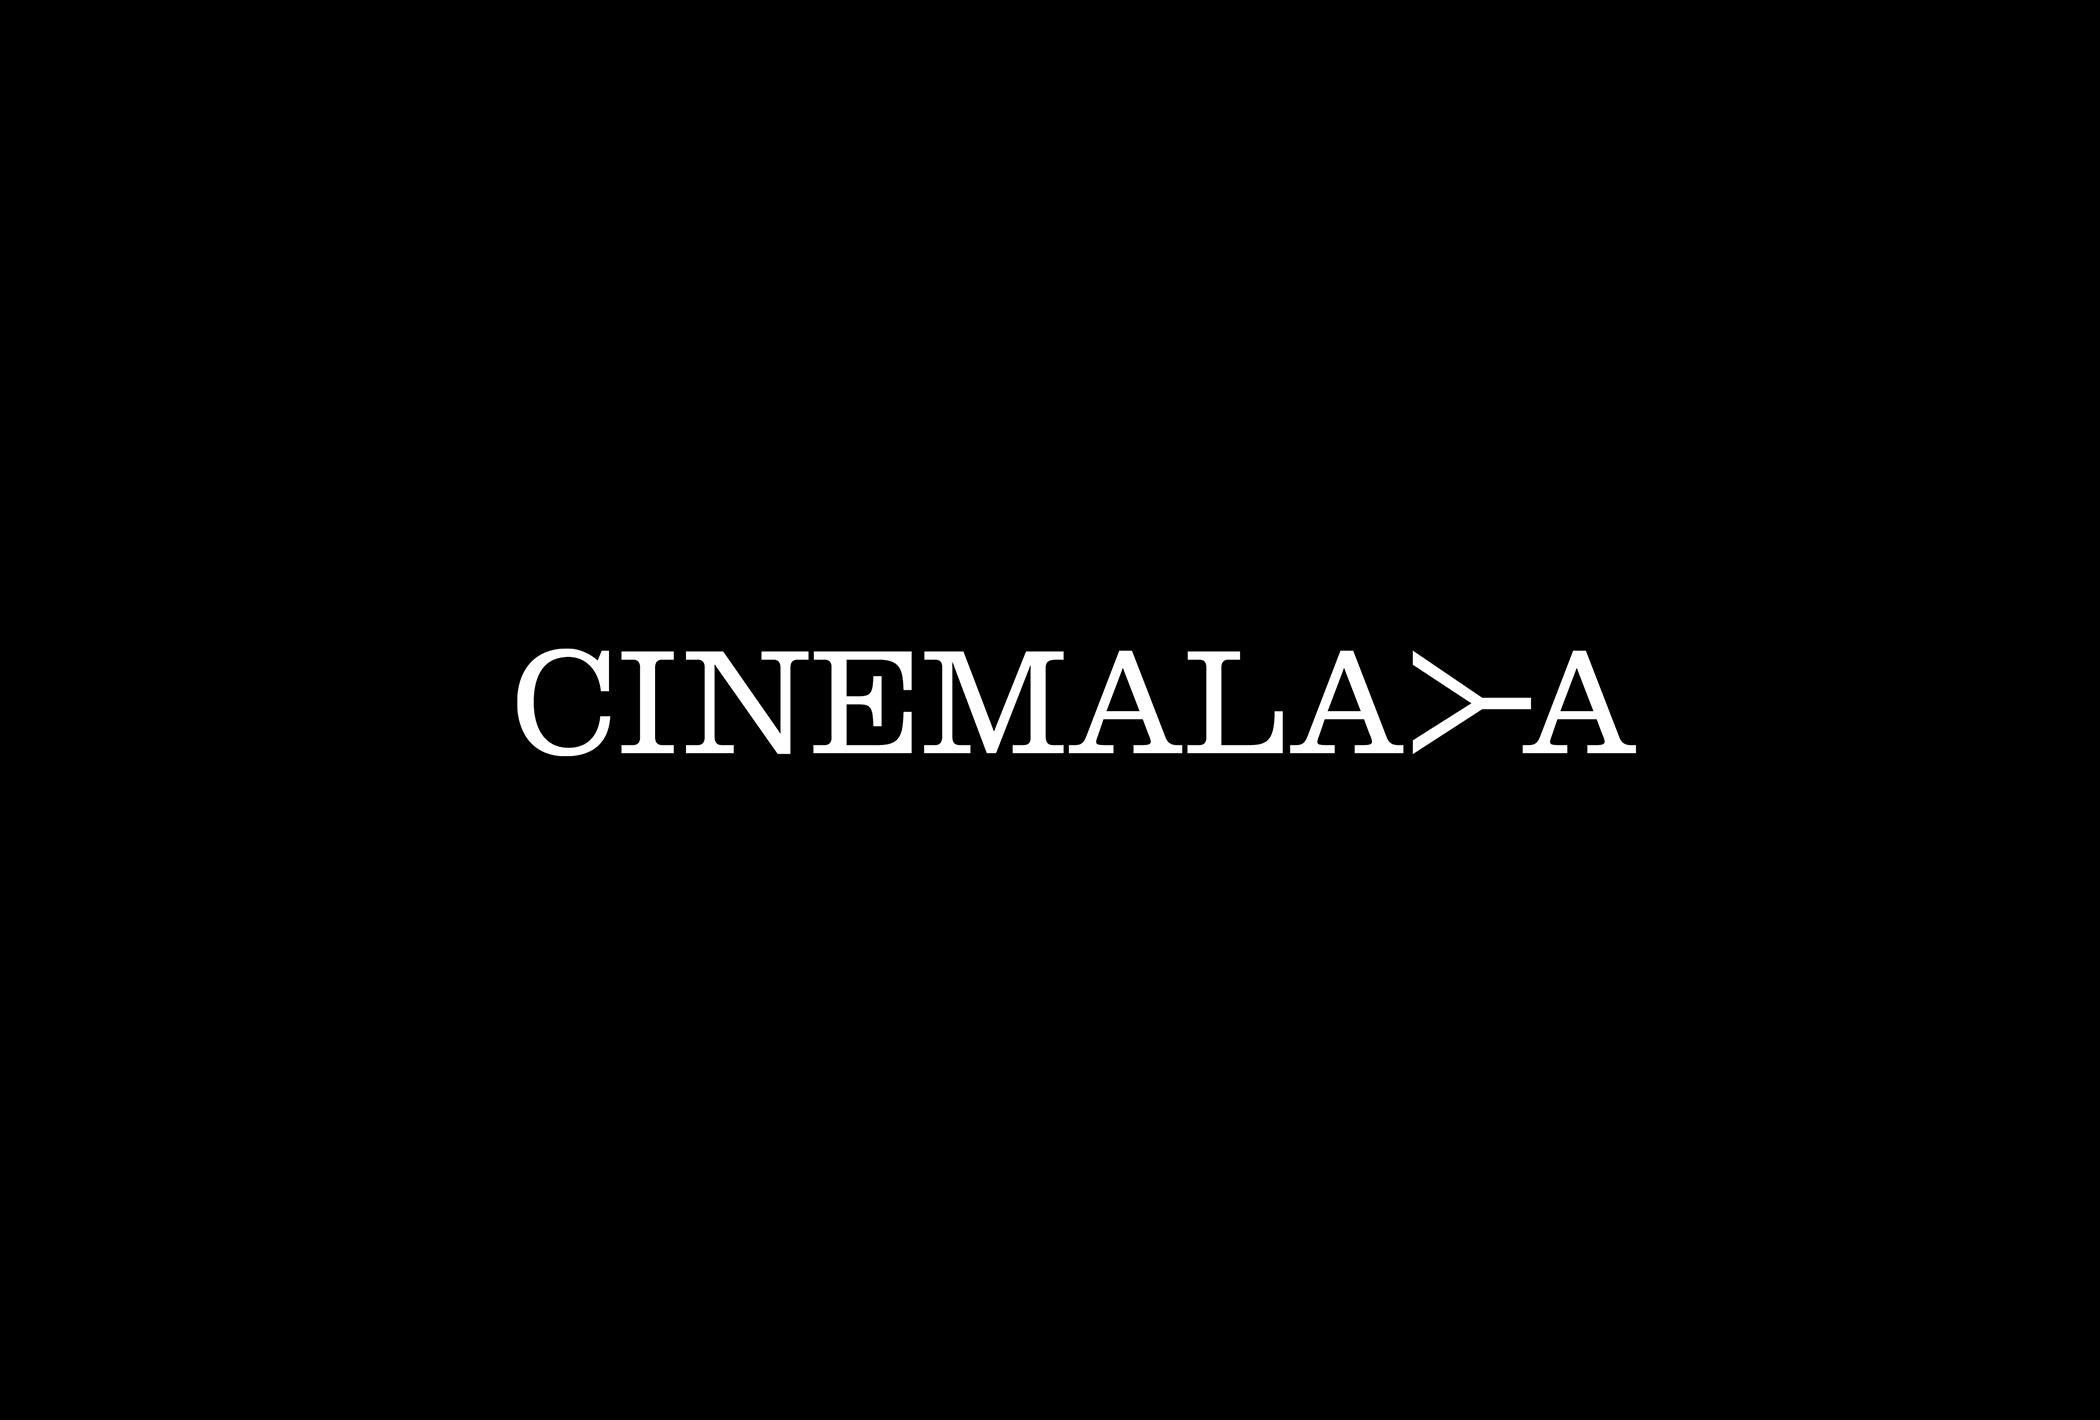 cinemalaya_LOGO.jpg